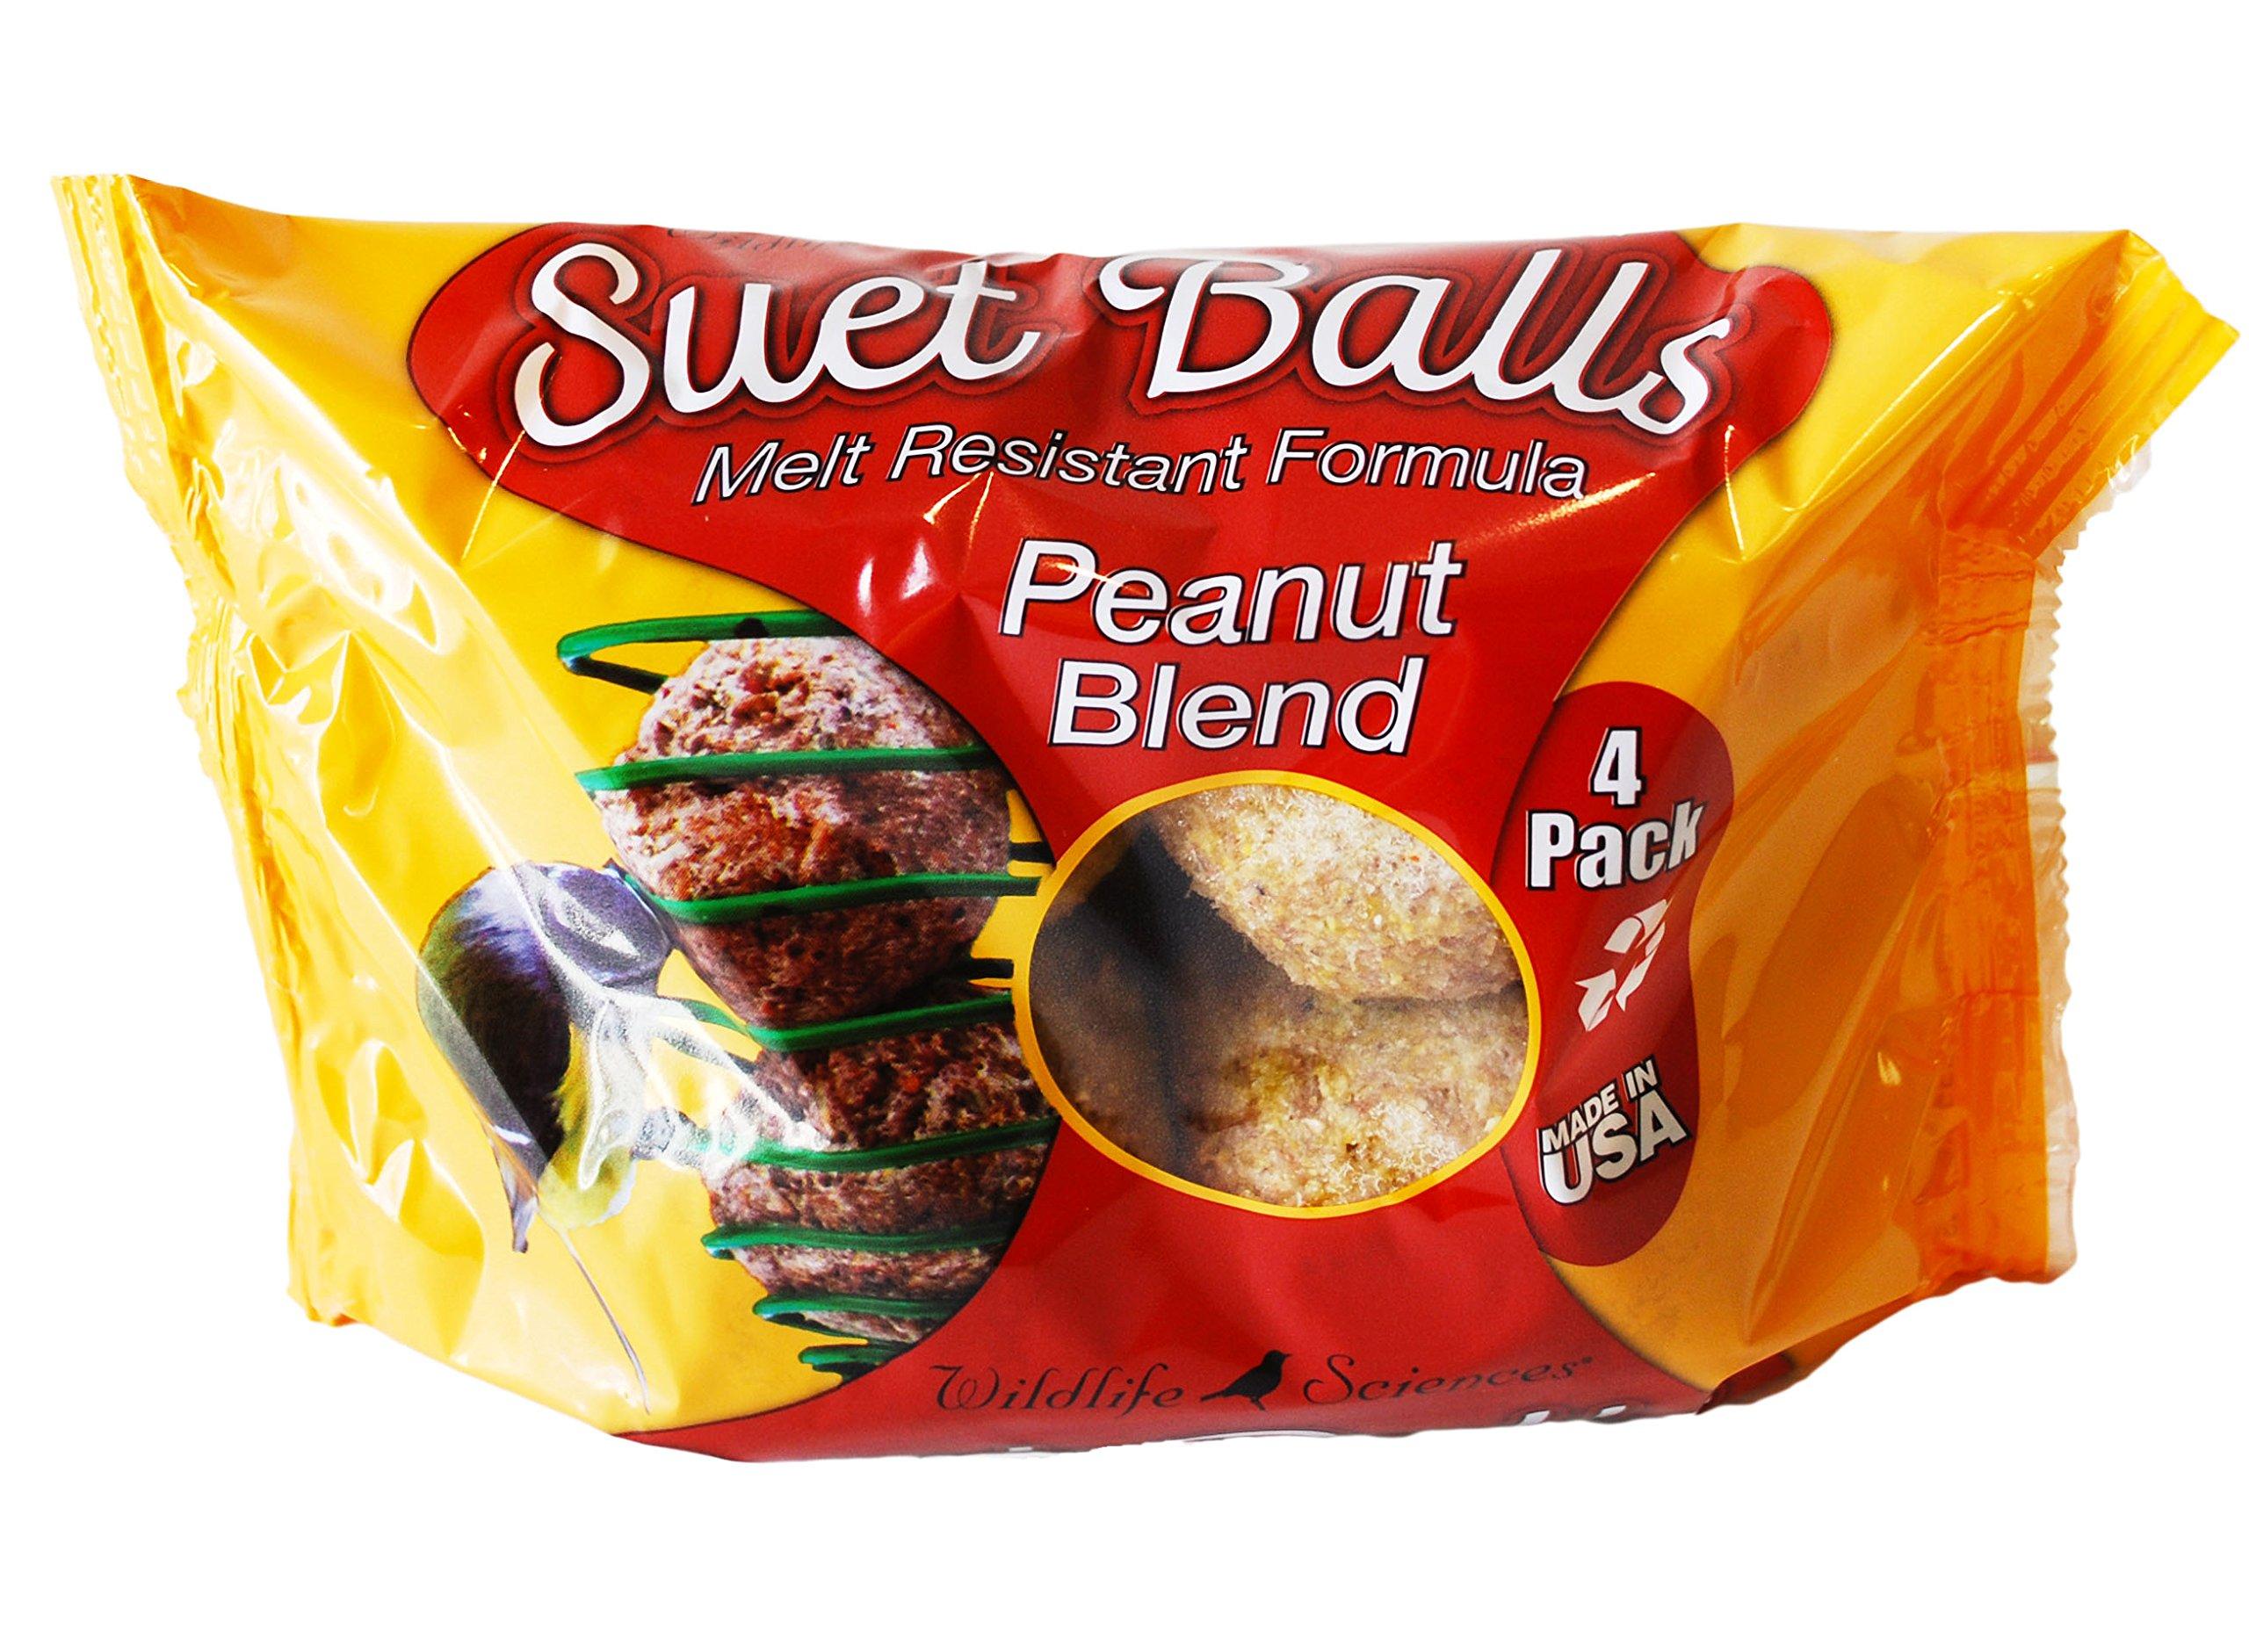 Peanut Blend Suet Balls 4 Pack, Case of 6